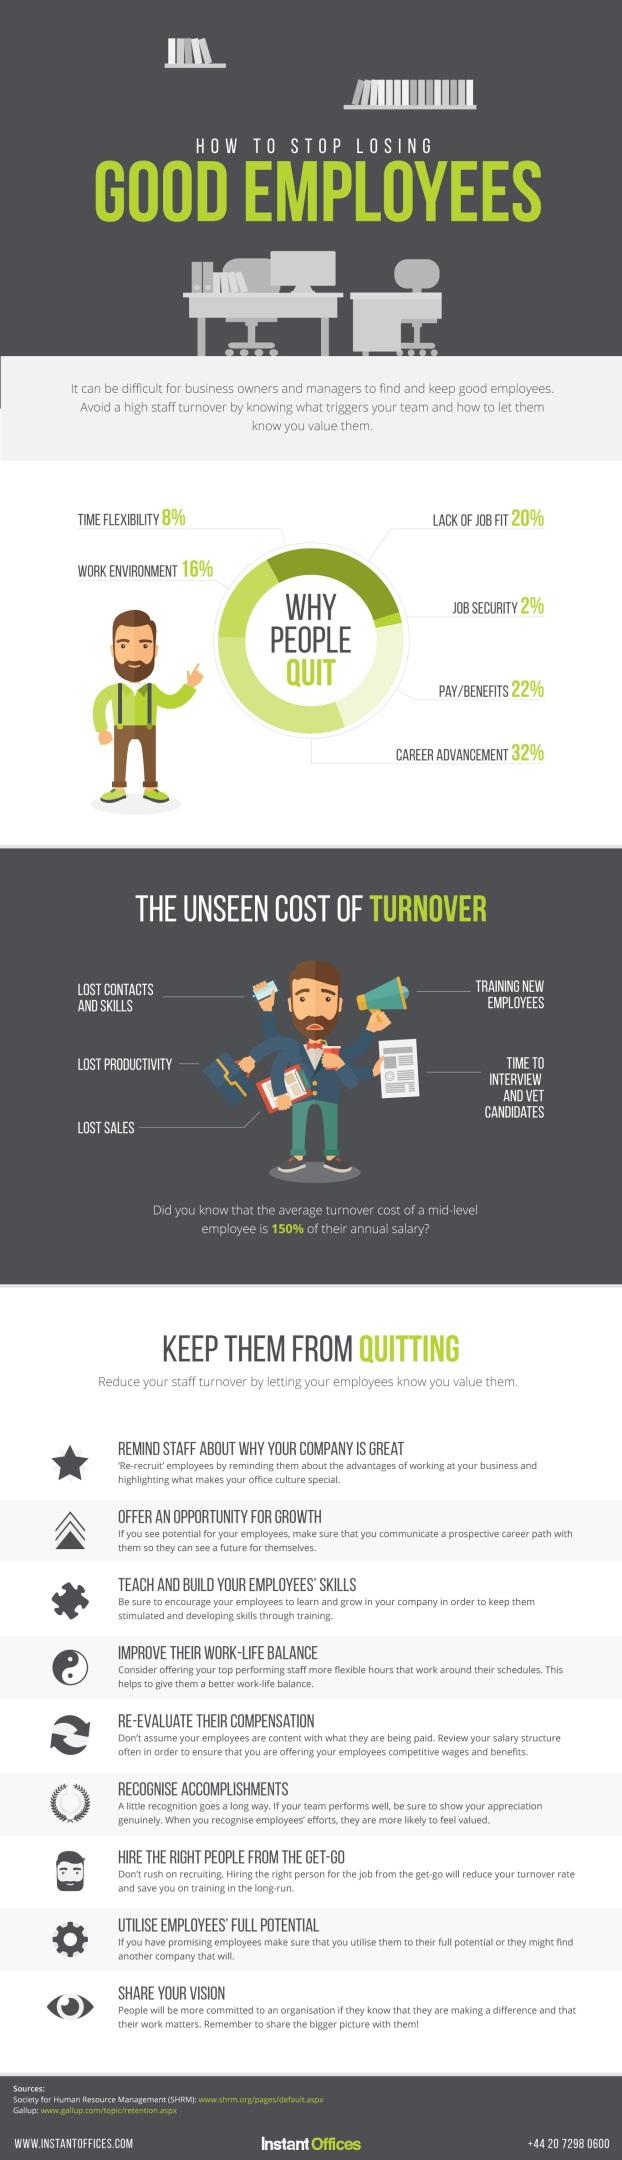 9 Ways to Avoid Losing Good Employees